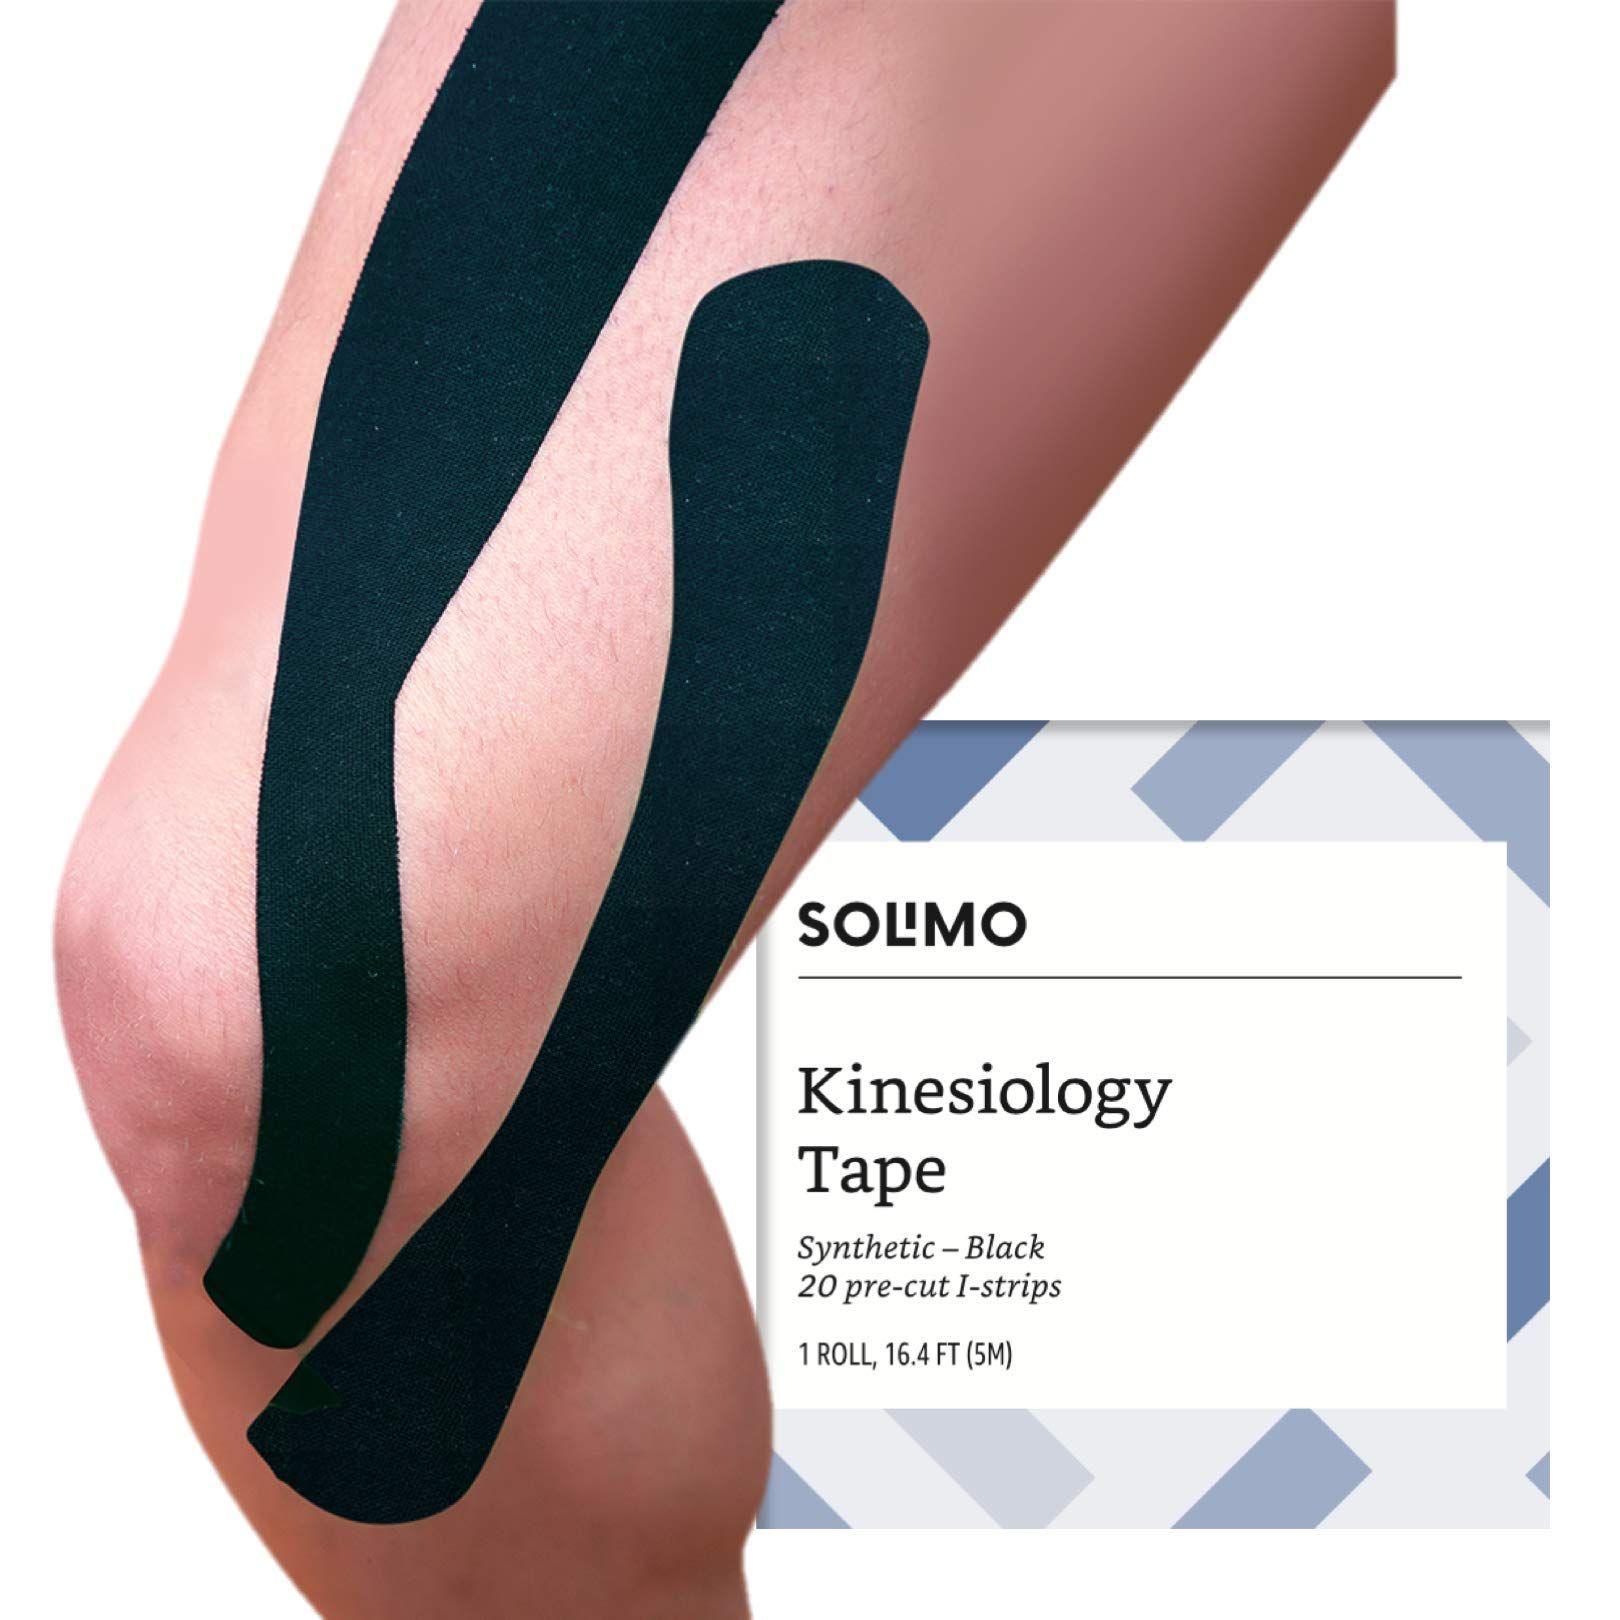 produits de commodité grosses soldes rétro Amazon Brand - Solimo Kinesiology Tape Synthetic I Strips ...